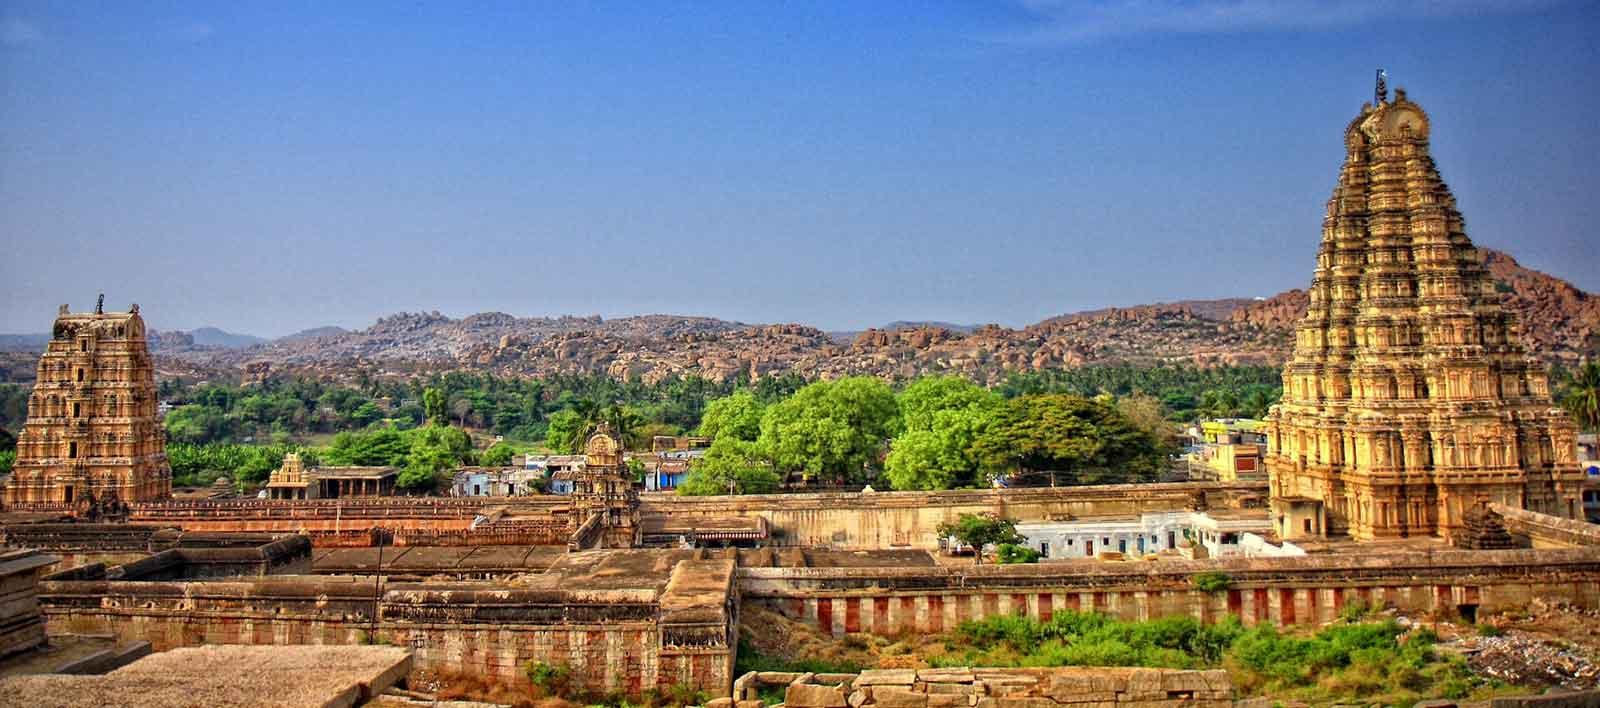 karnataka-historical